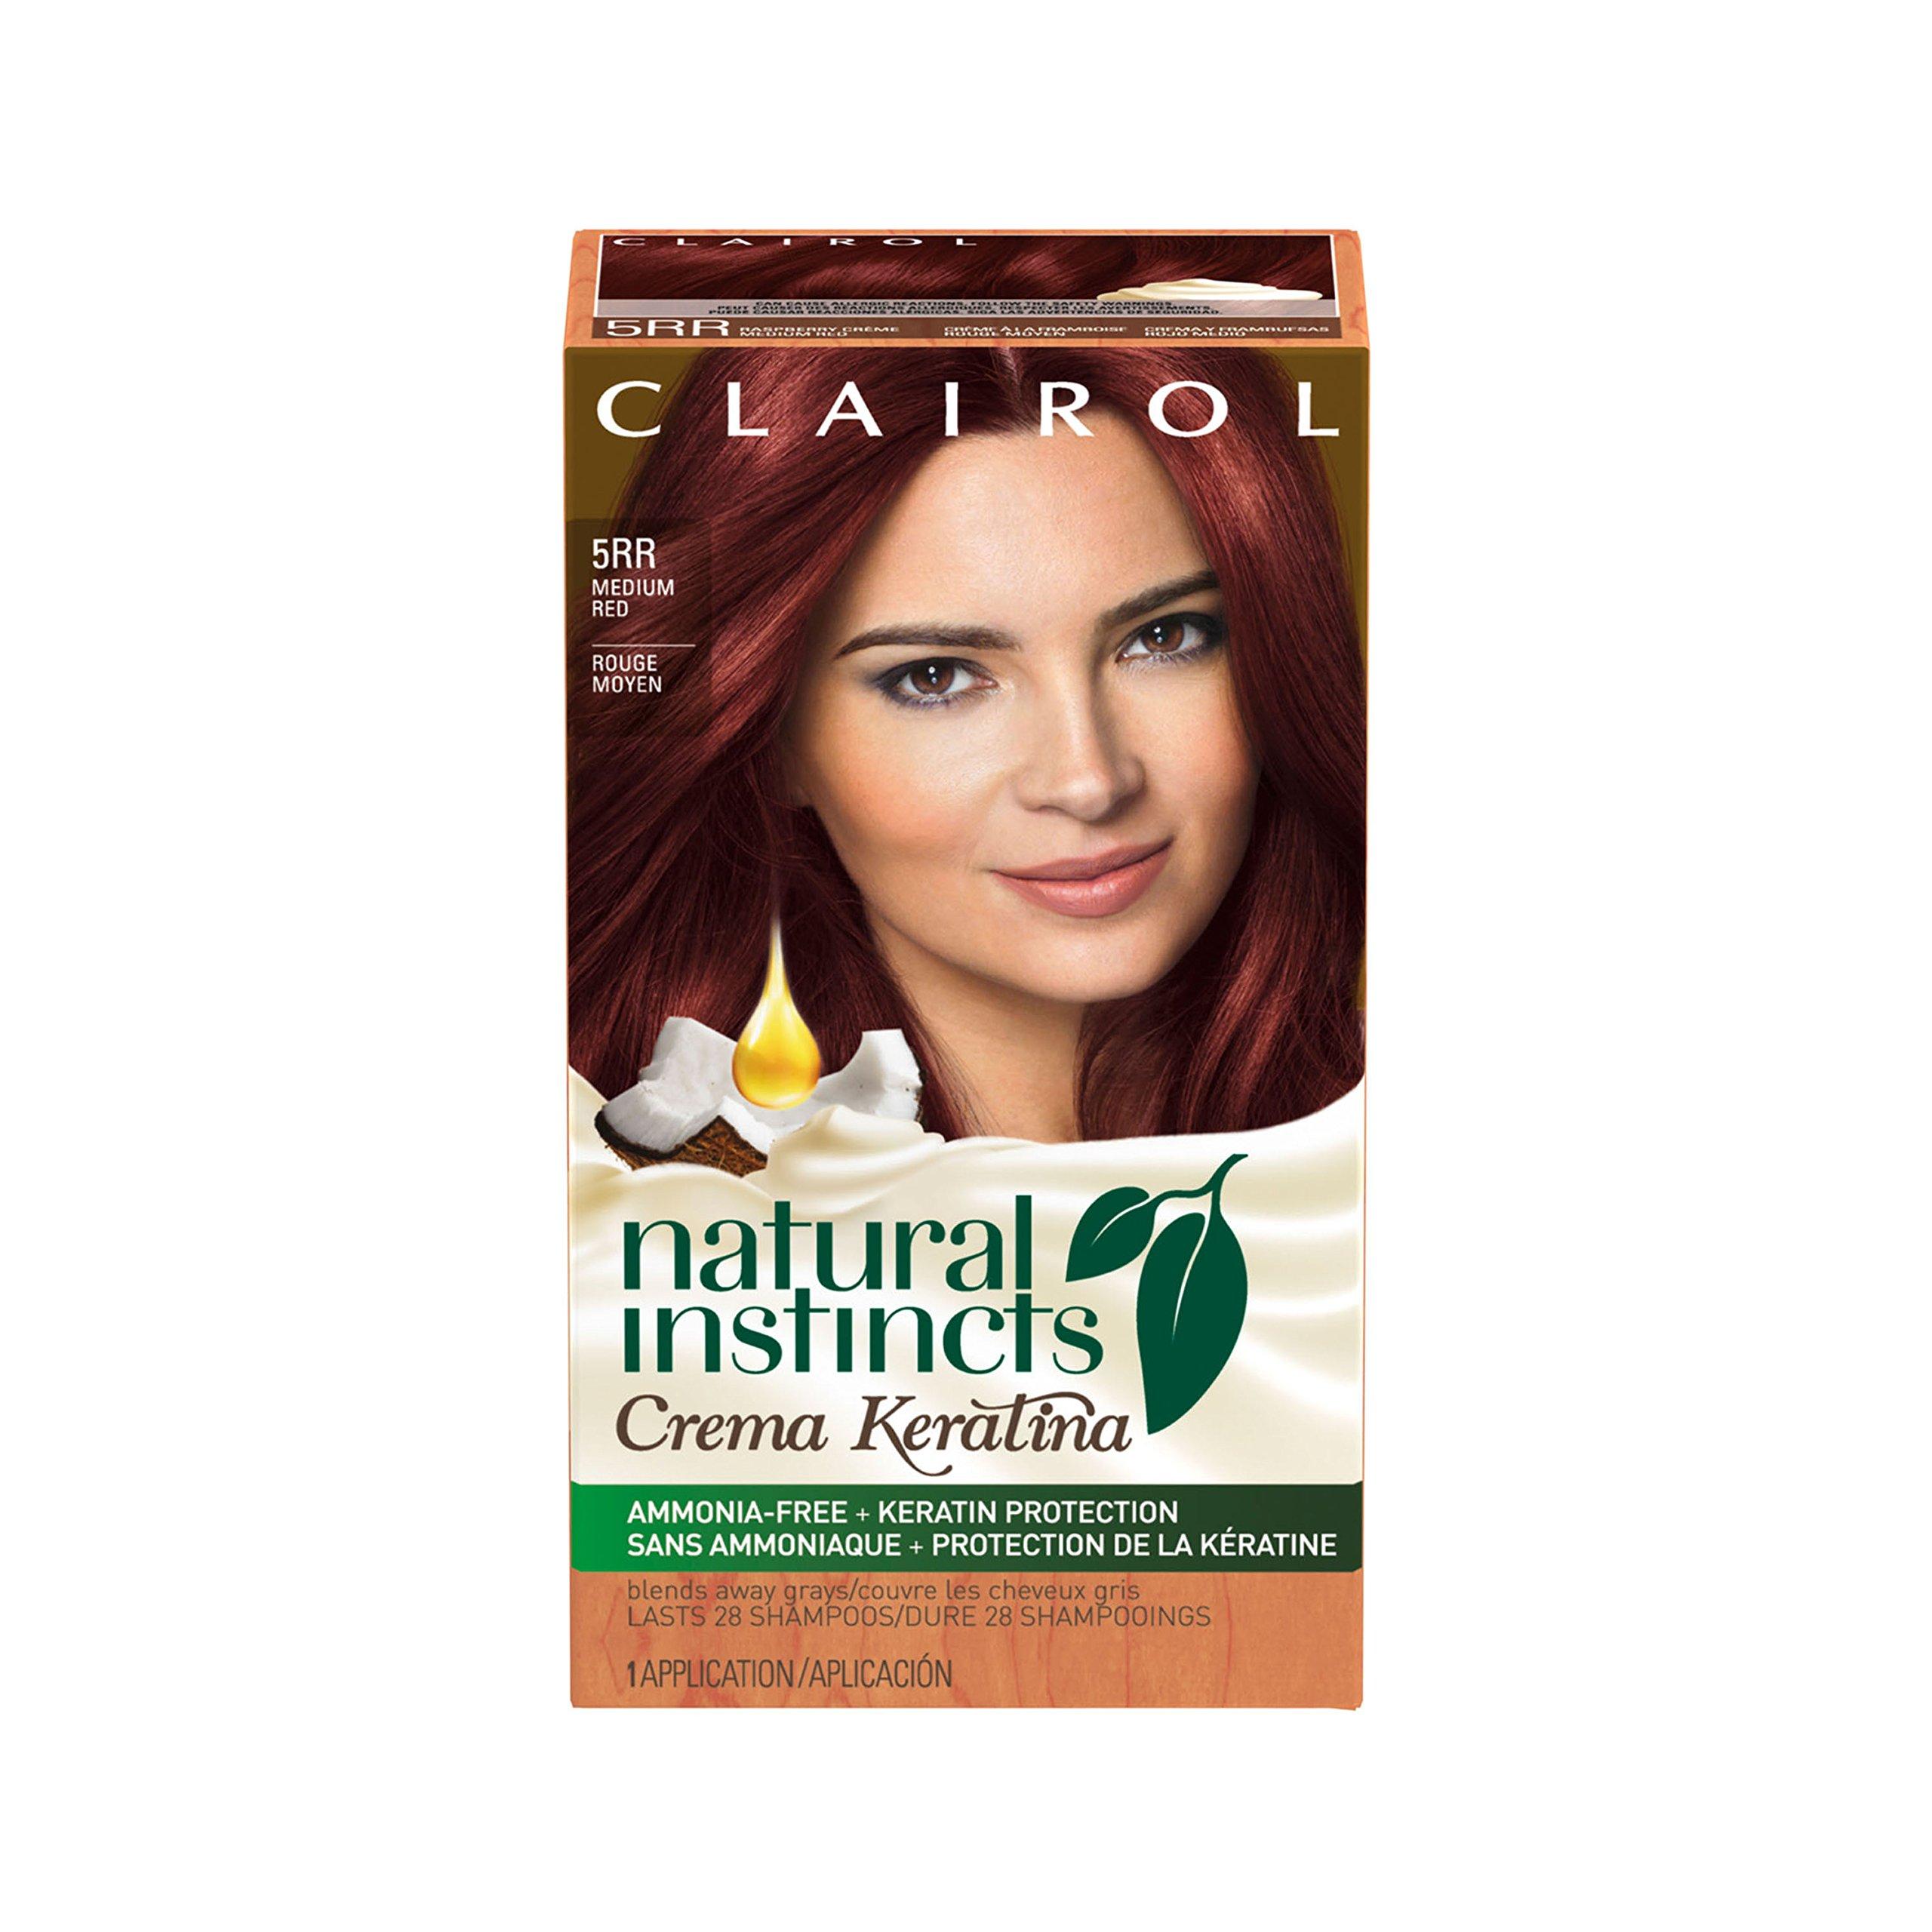 Clairol Natural Instincts Crema Keratina Hair Color Kit, Medium Red 5RR (1 Application) by Clairol